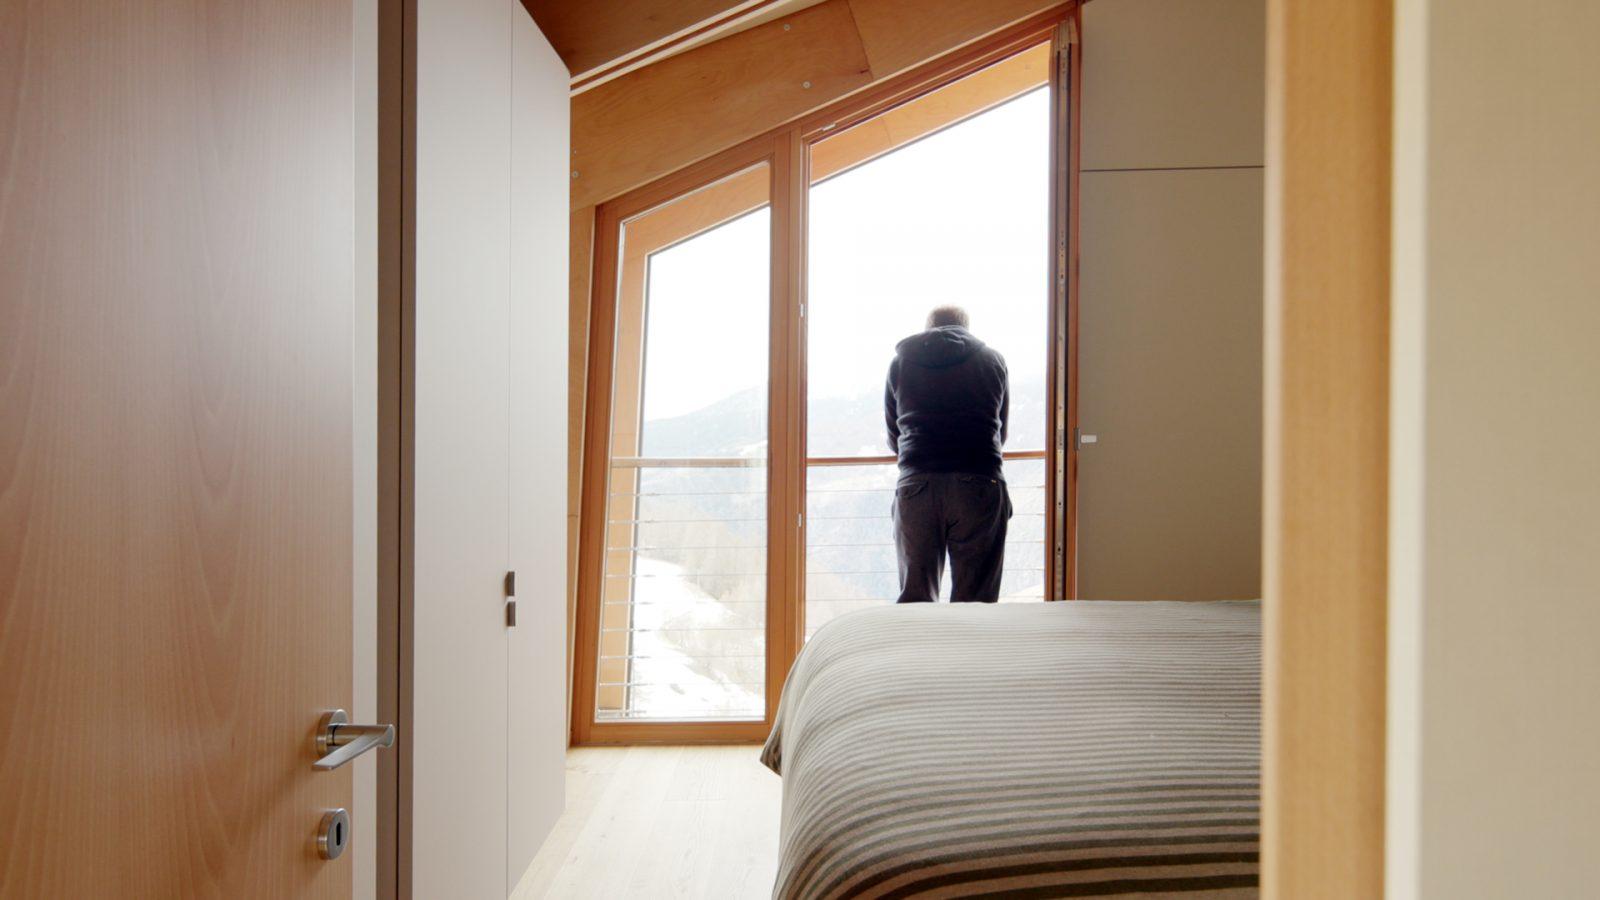 LeapHome Chamois bedroom window